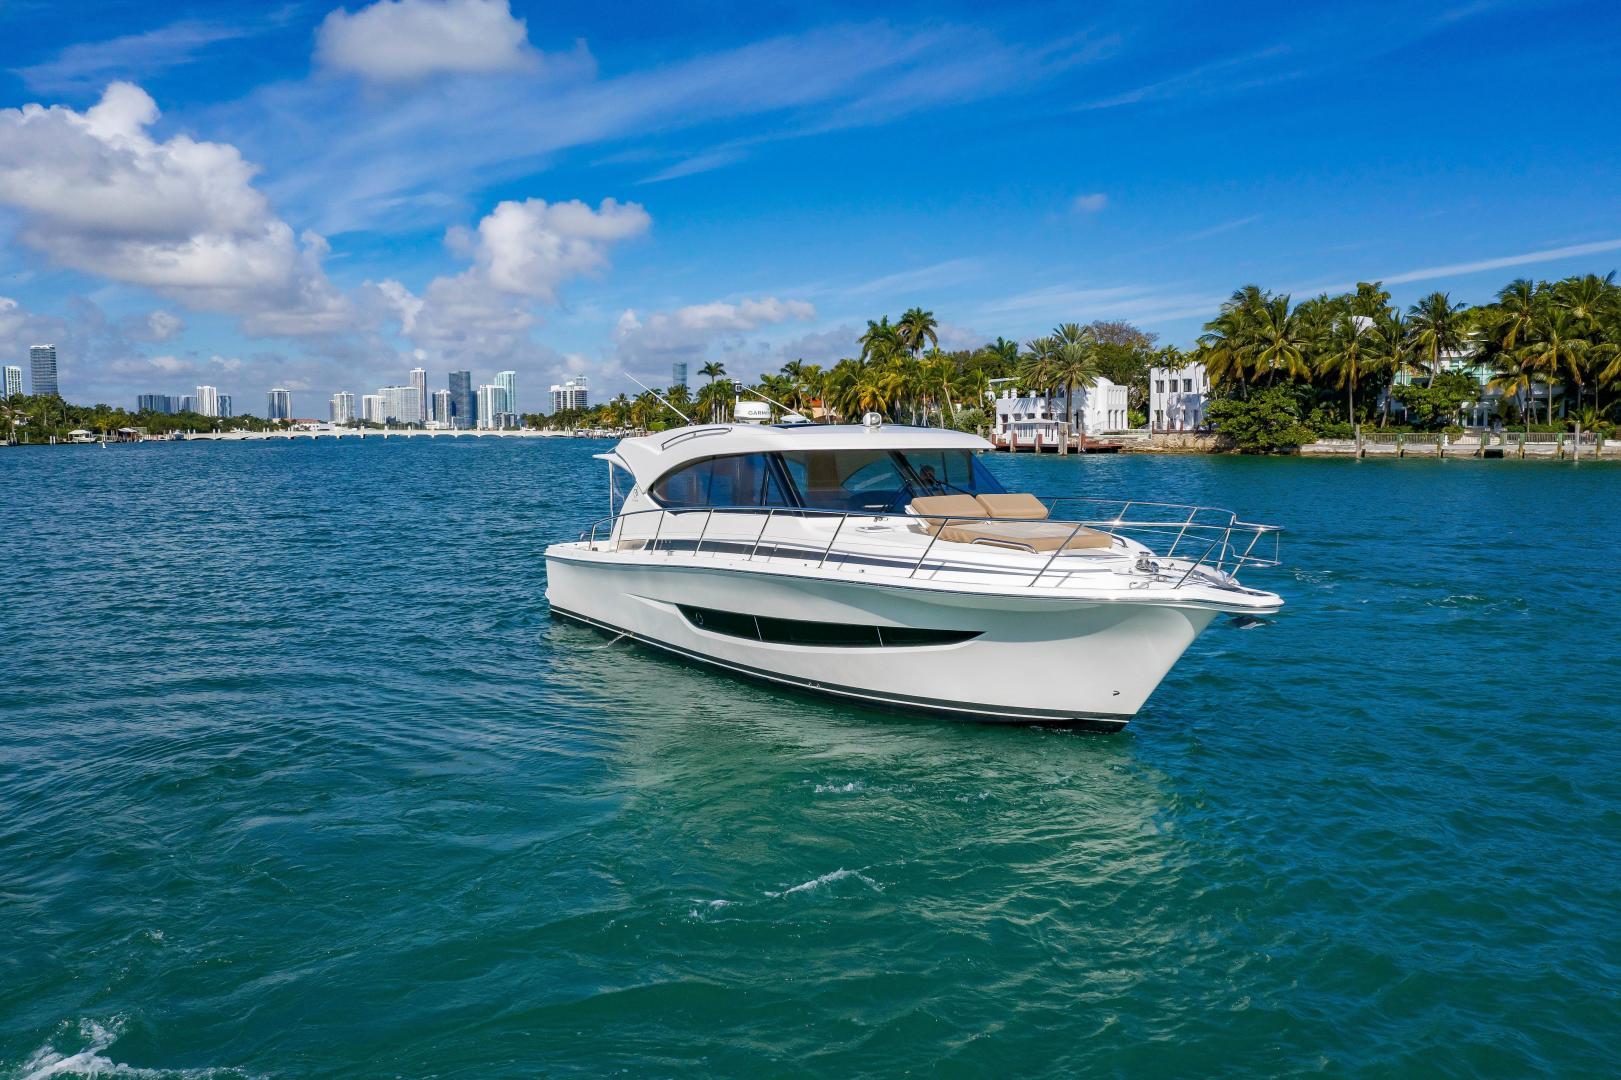 Riviera-395 SUV 2019-Ipanema Miami Beach-Florida-United States-1614868   Thumbnail